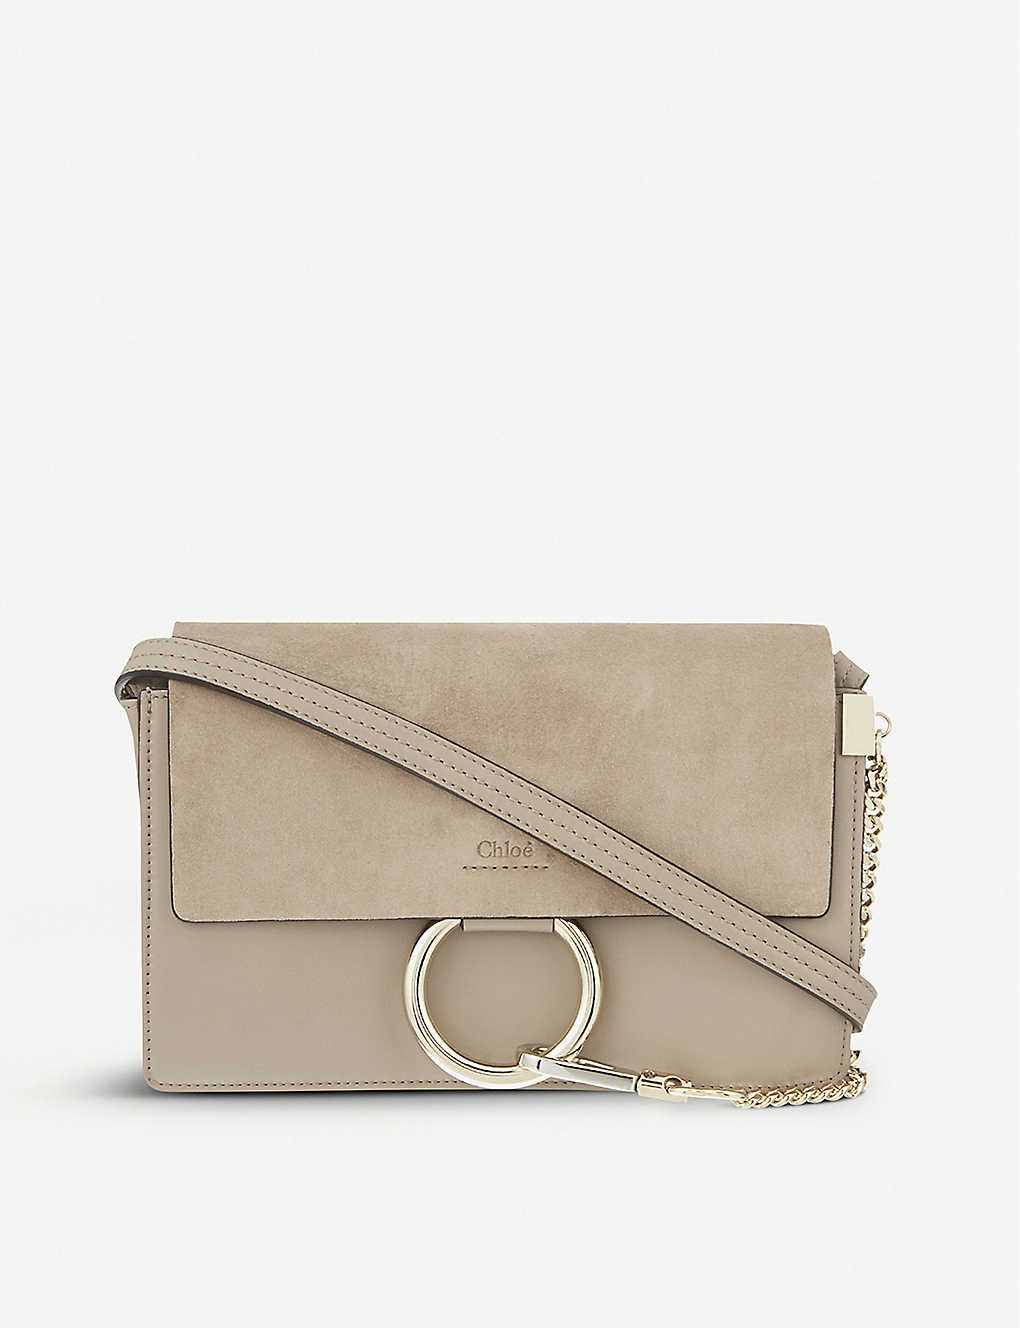 5905e6e0e4 Faye small leather shoulder bag